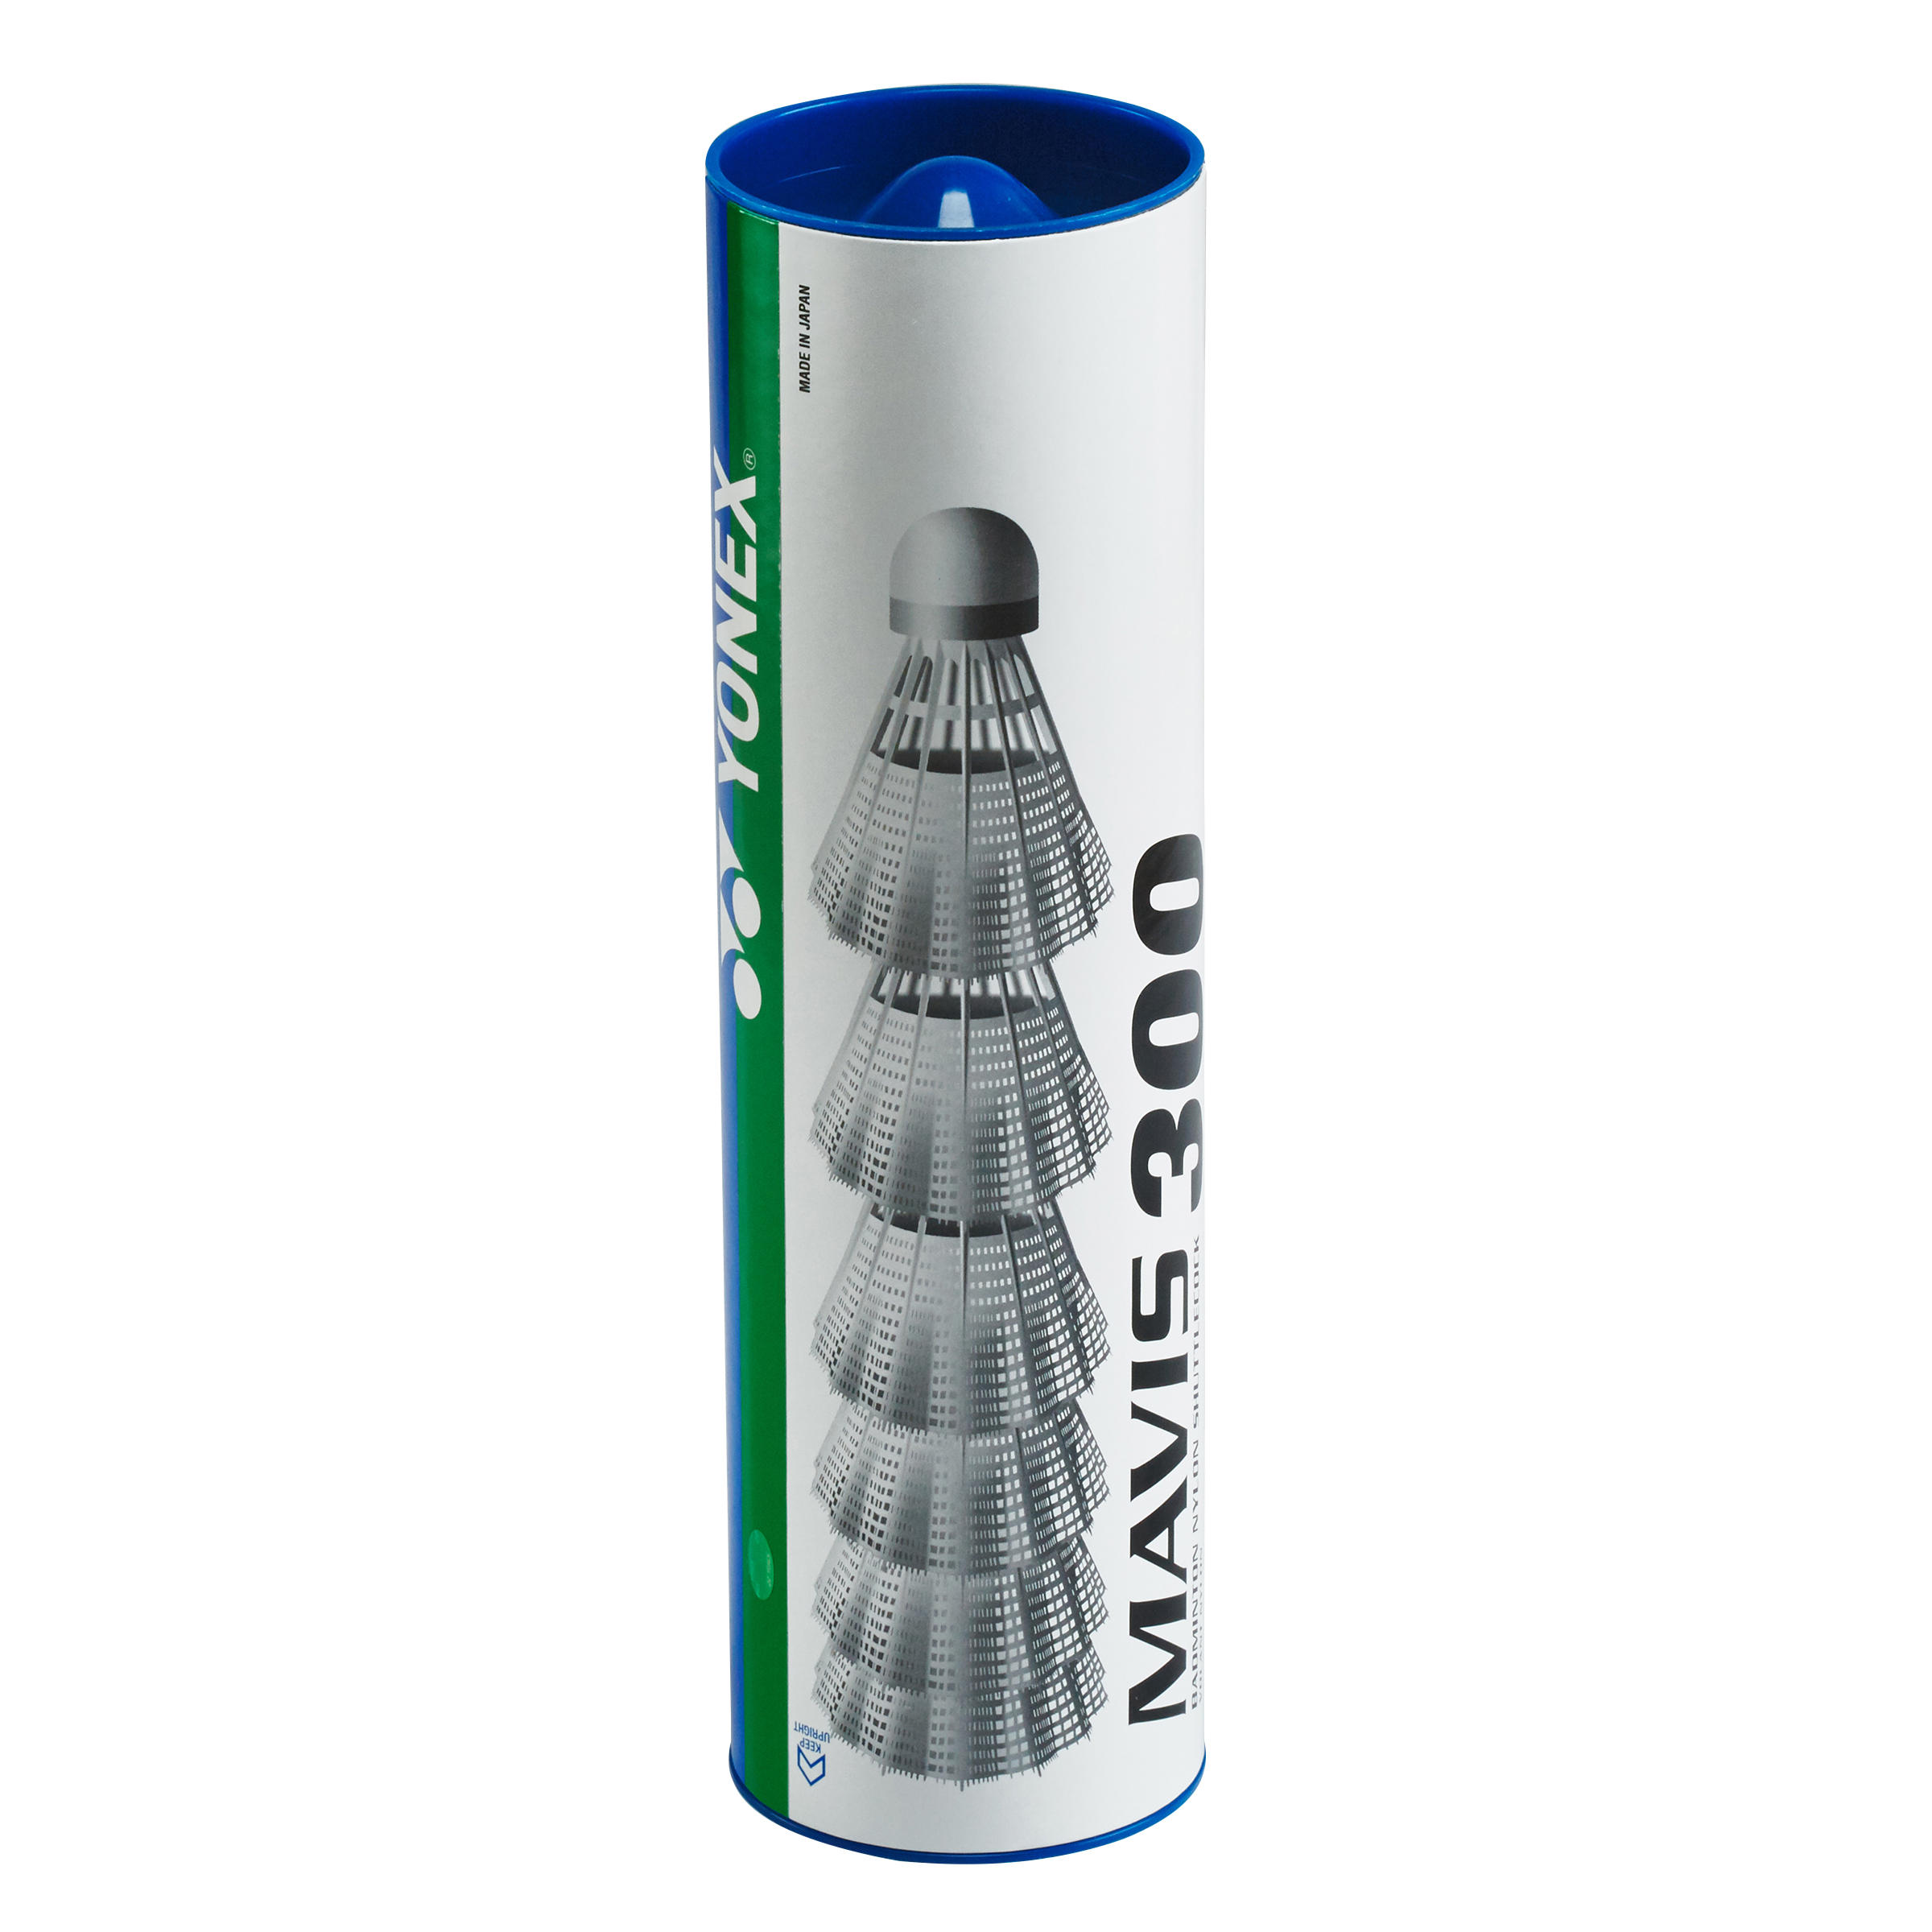 Yonex Badmintonshuttles Mavix 200 wit set van 6